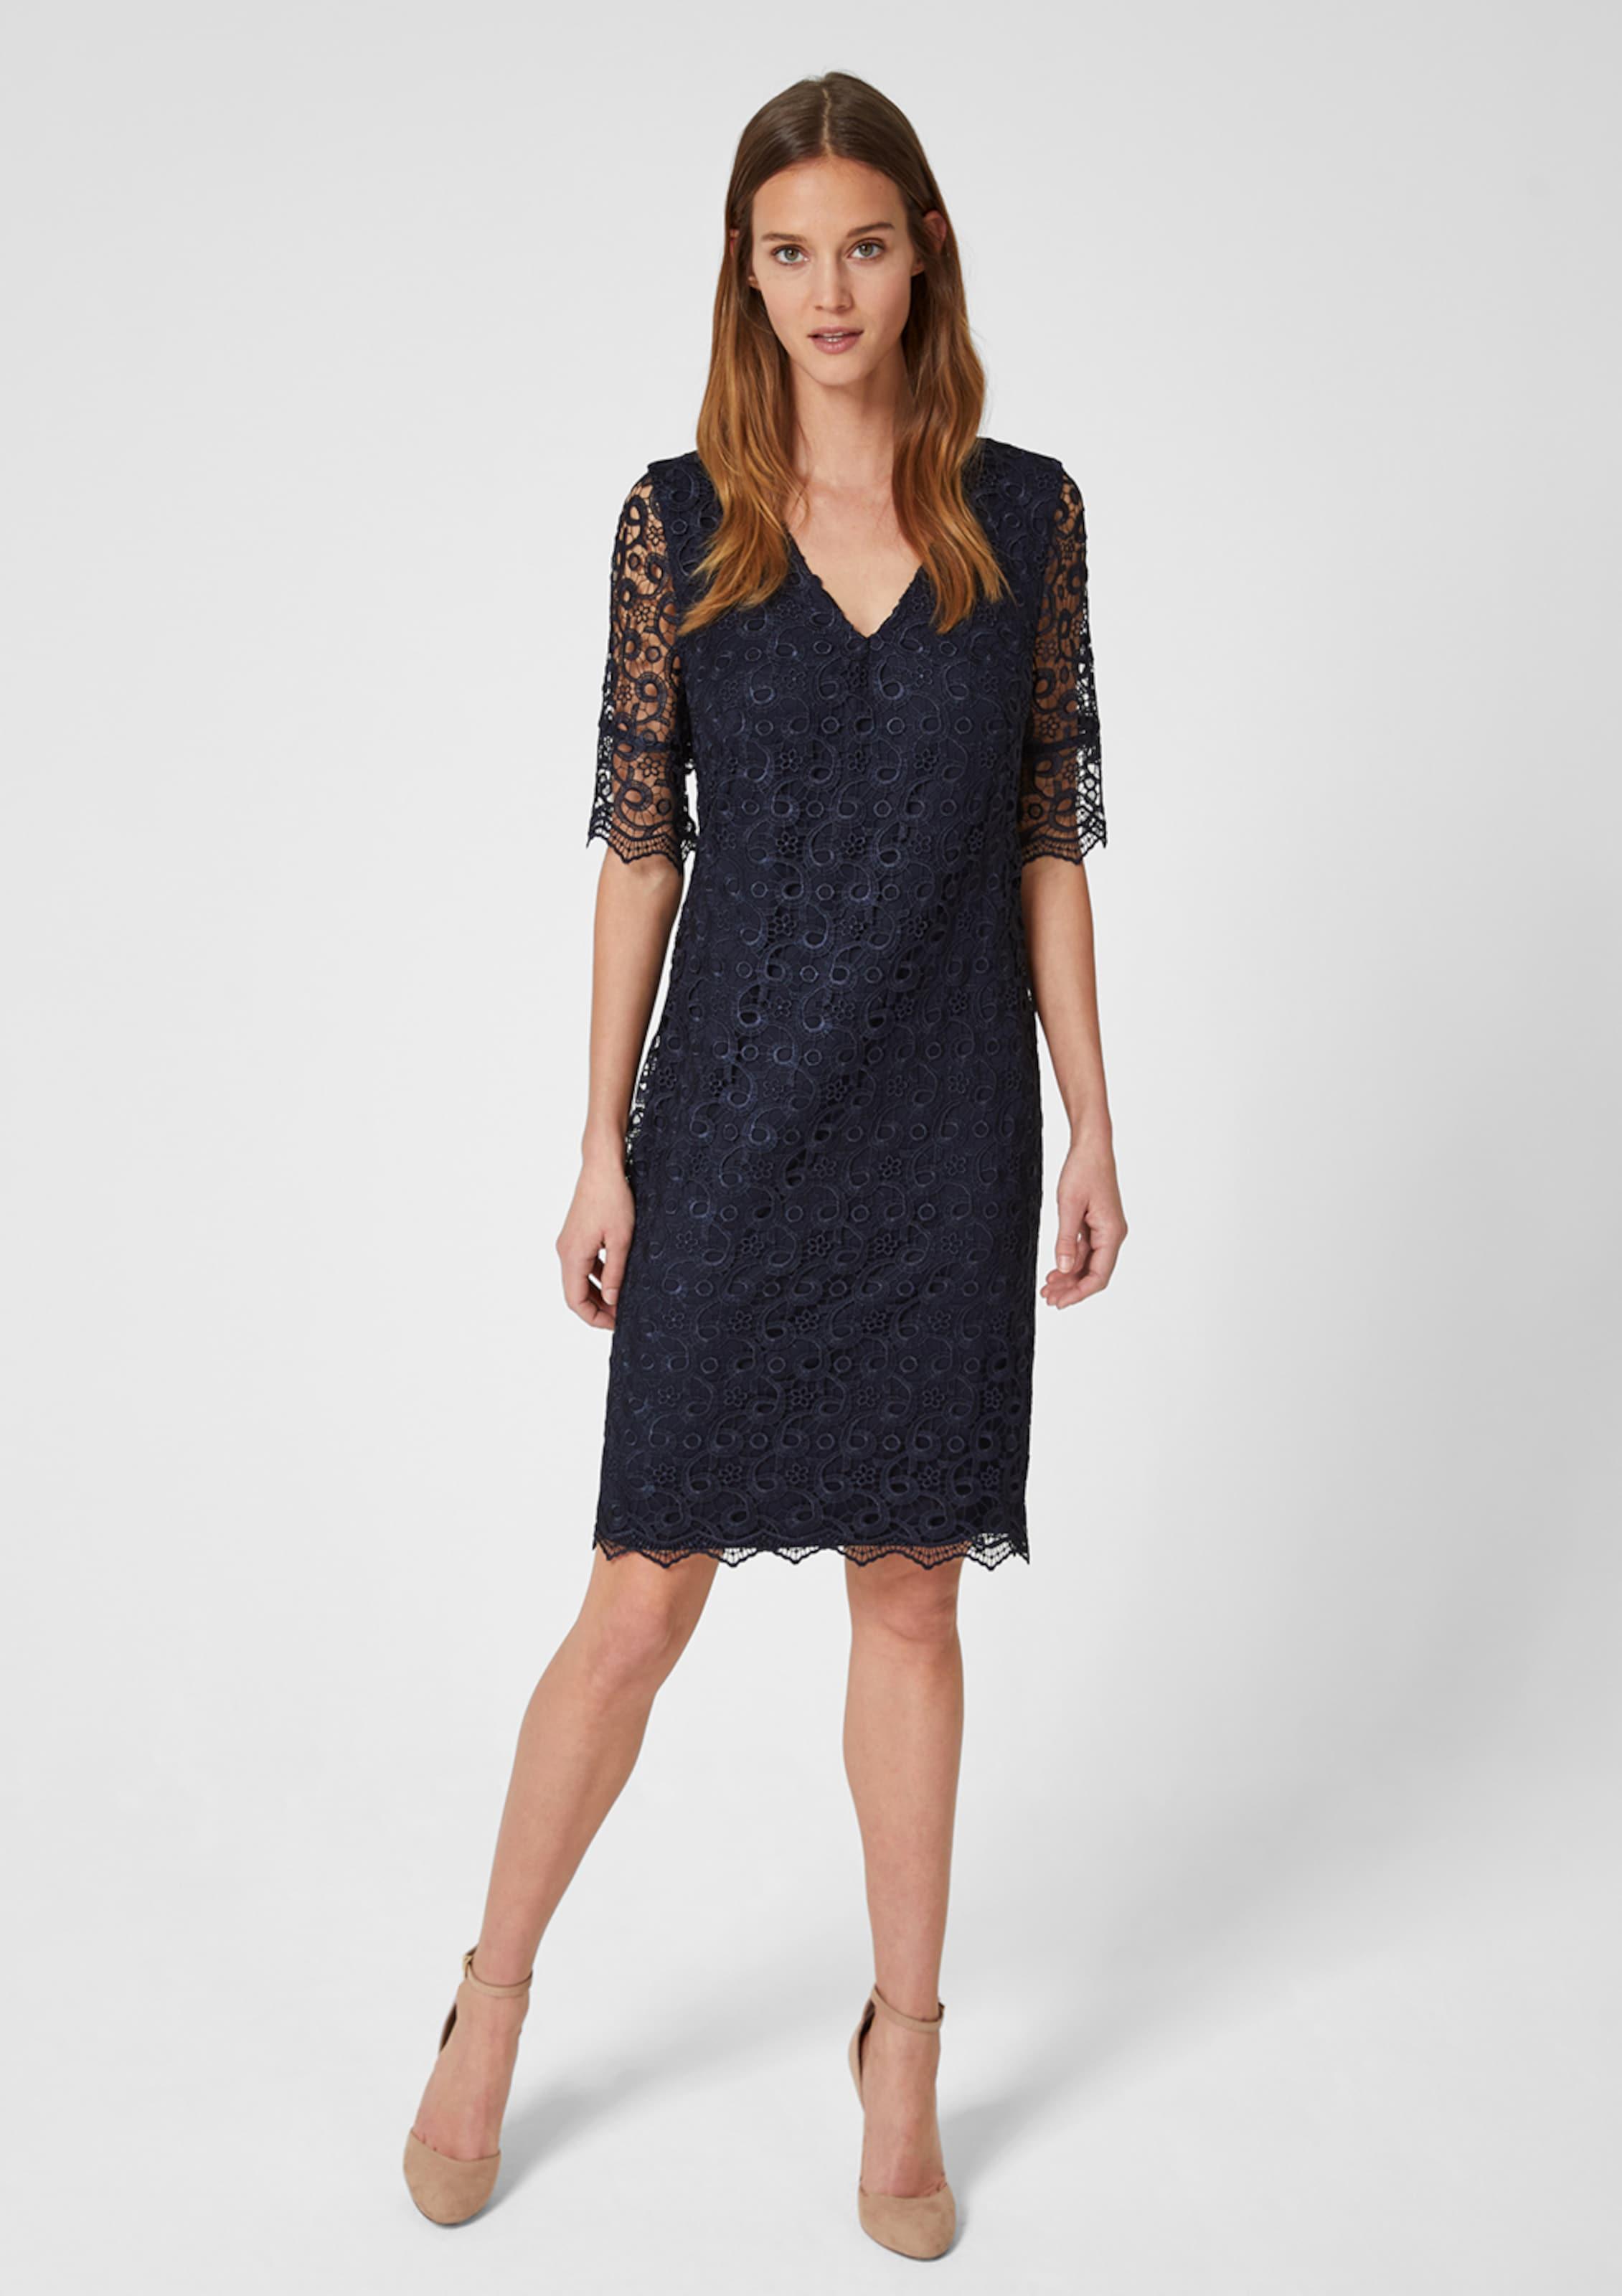 S Kleid Label Black Nachtblau In oliver NnPX8kw0O